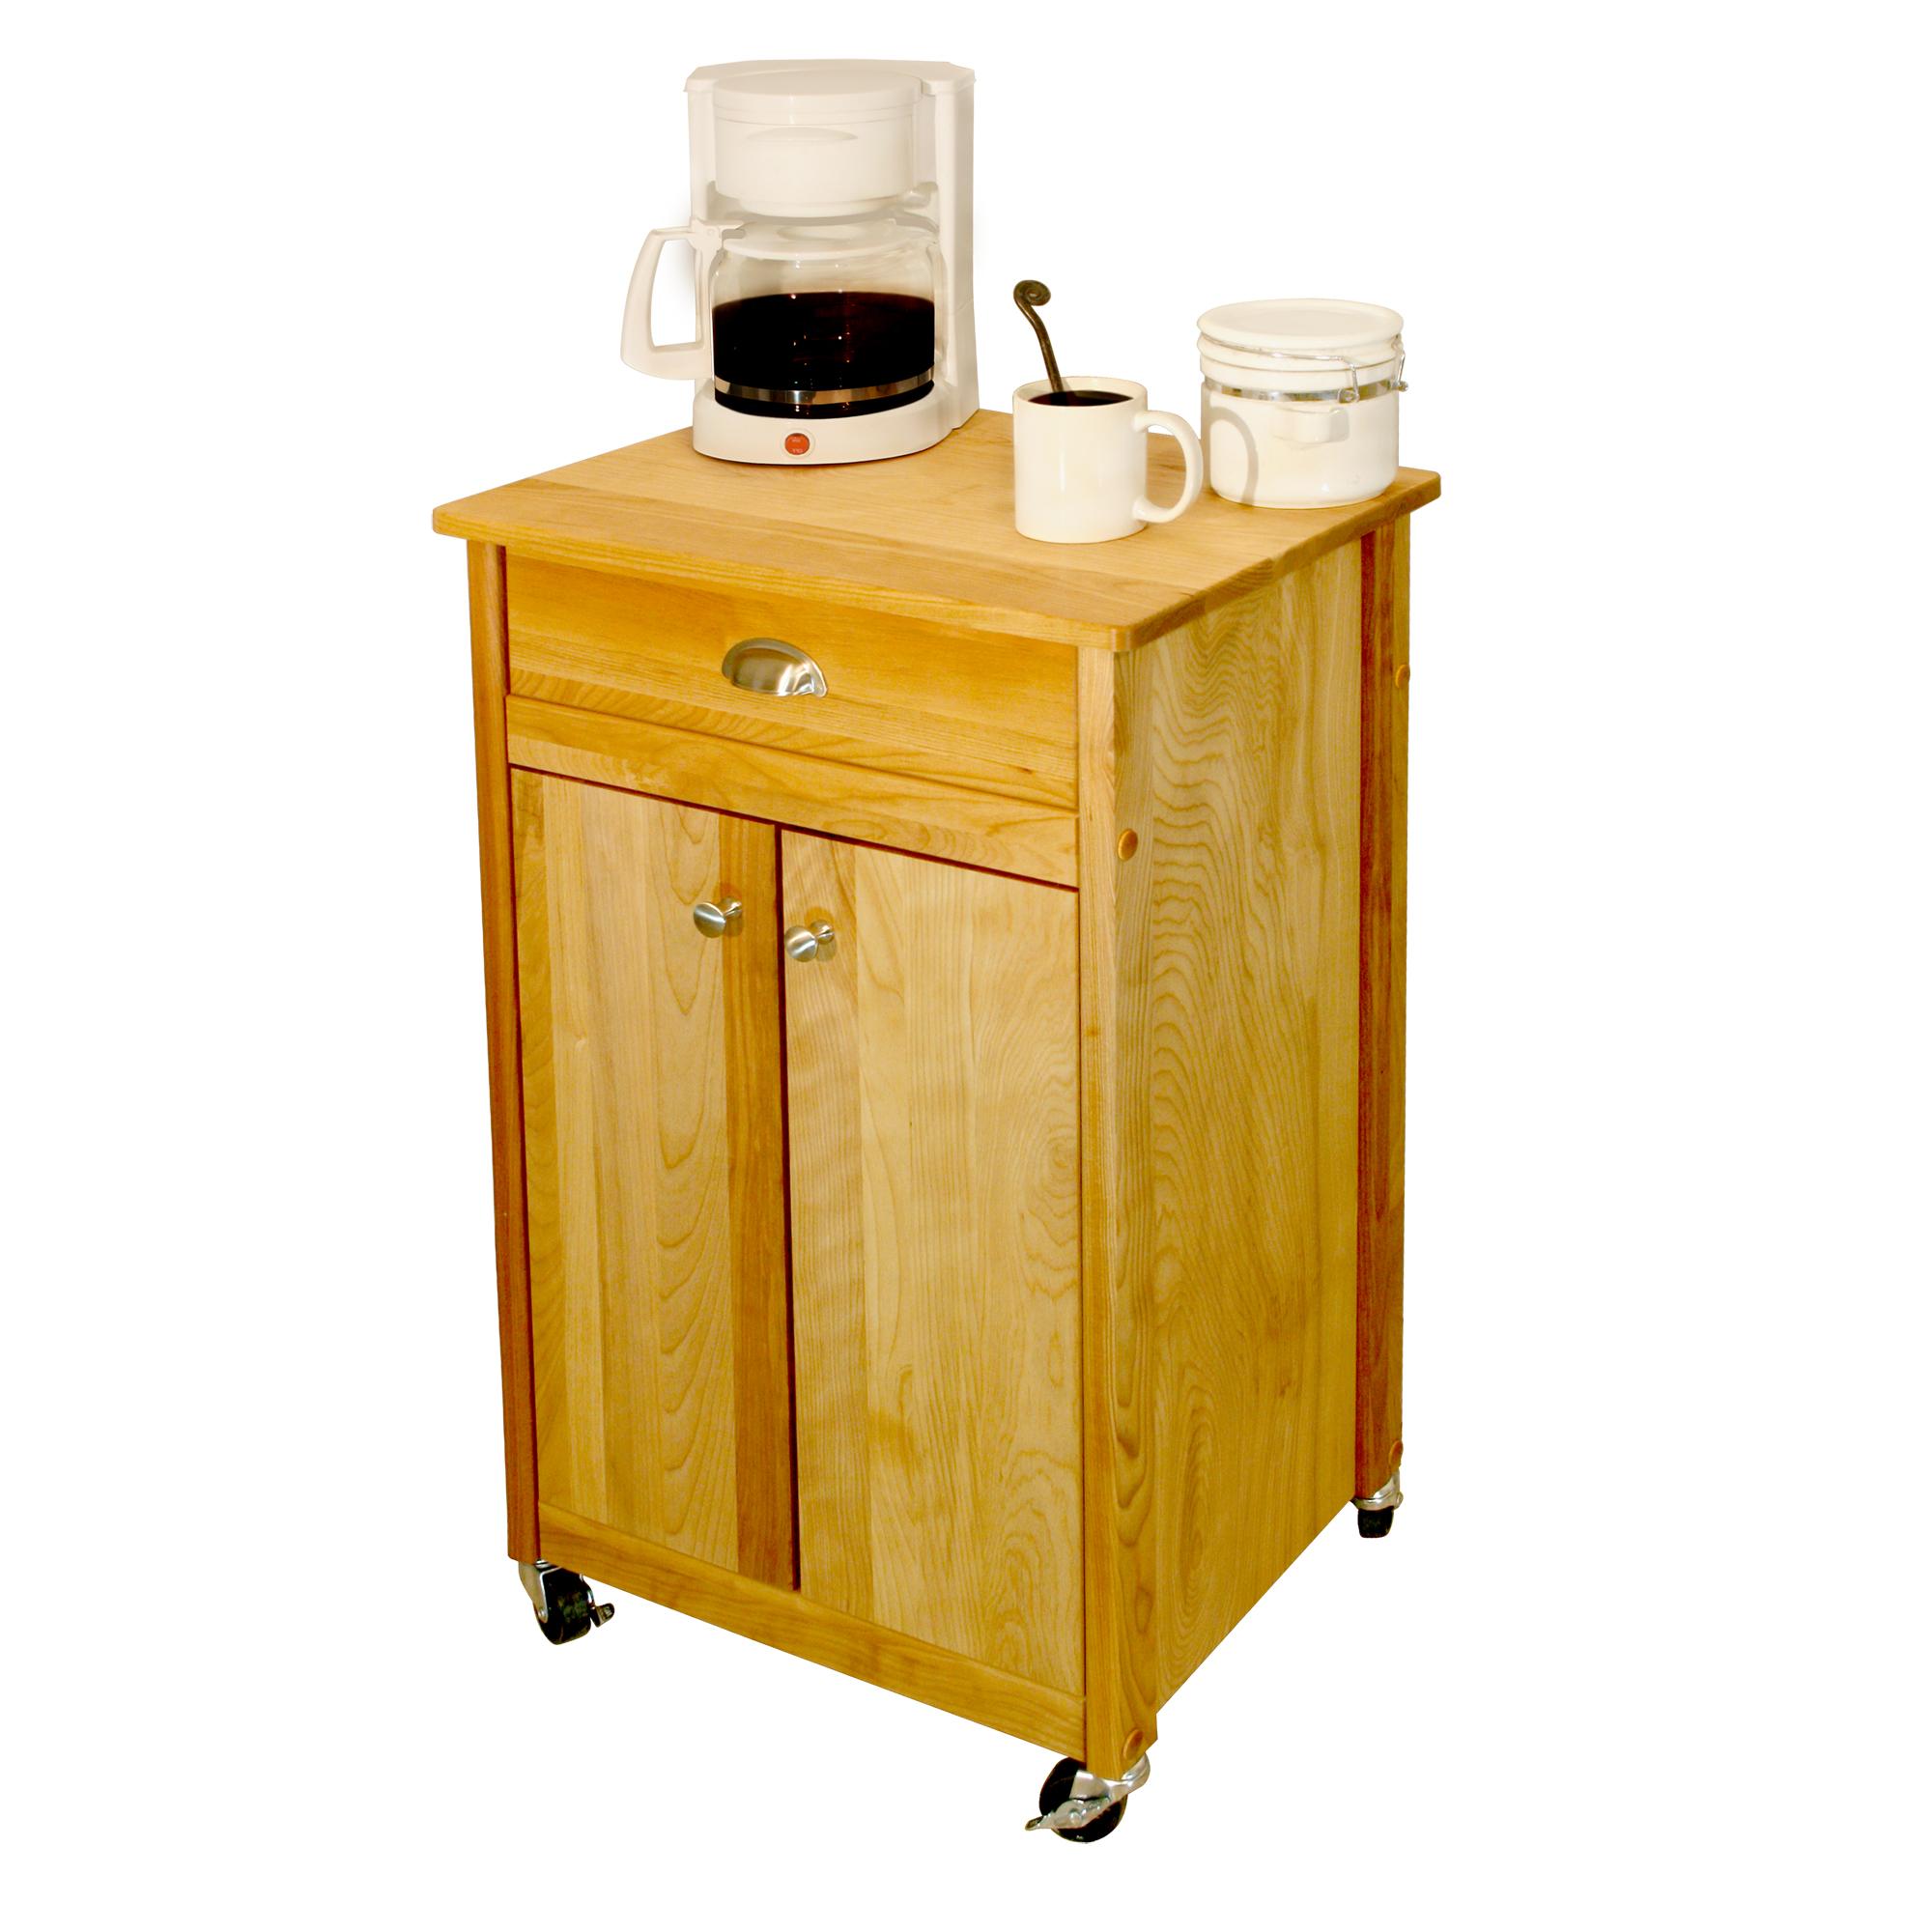 economy kitchen cart catskill deluxe cuisine cart economy kitchen cart catskill deluxe cuisine cart